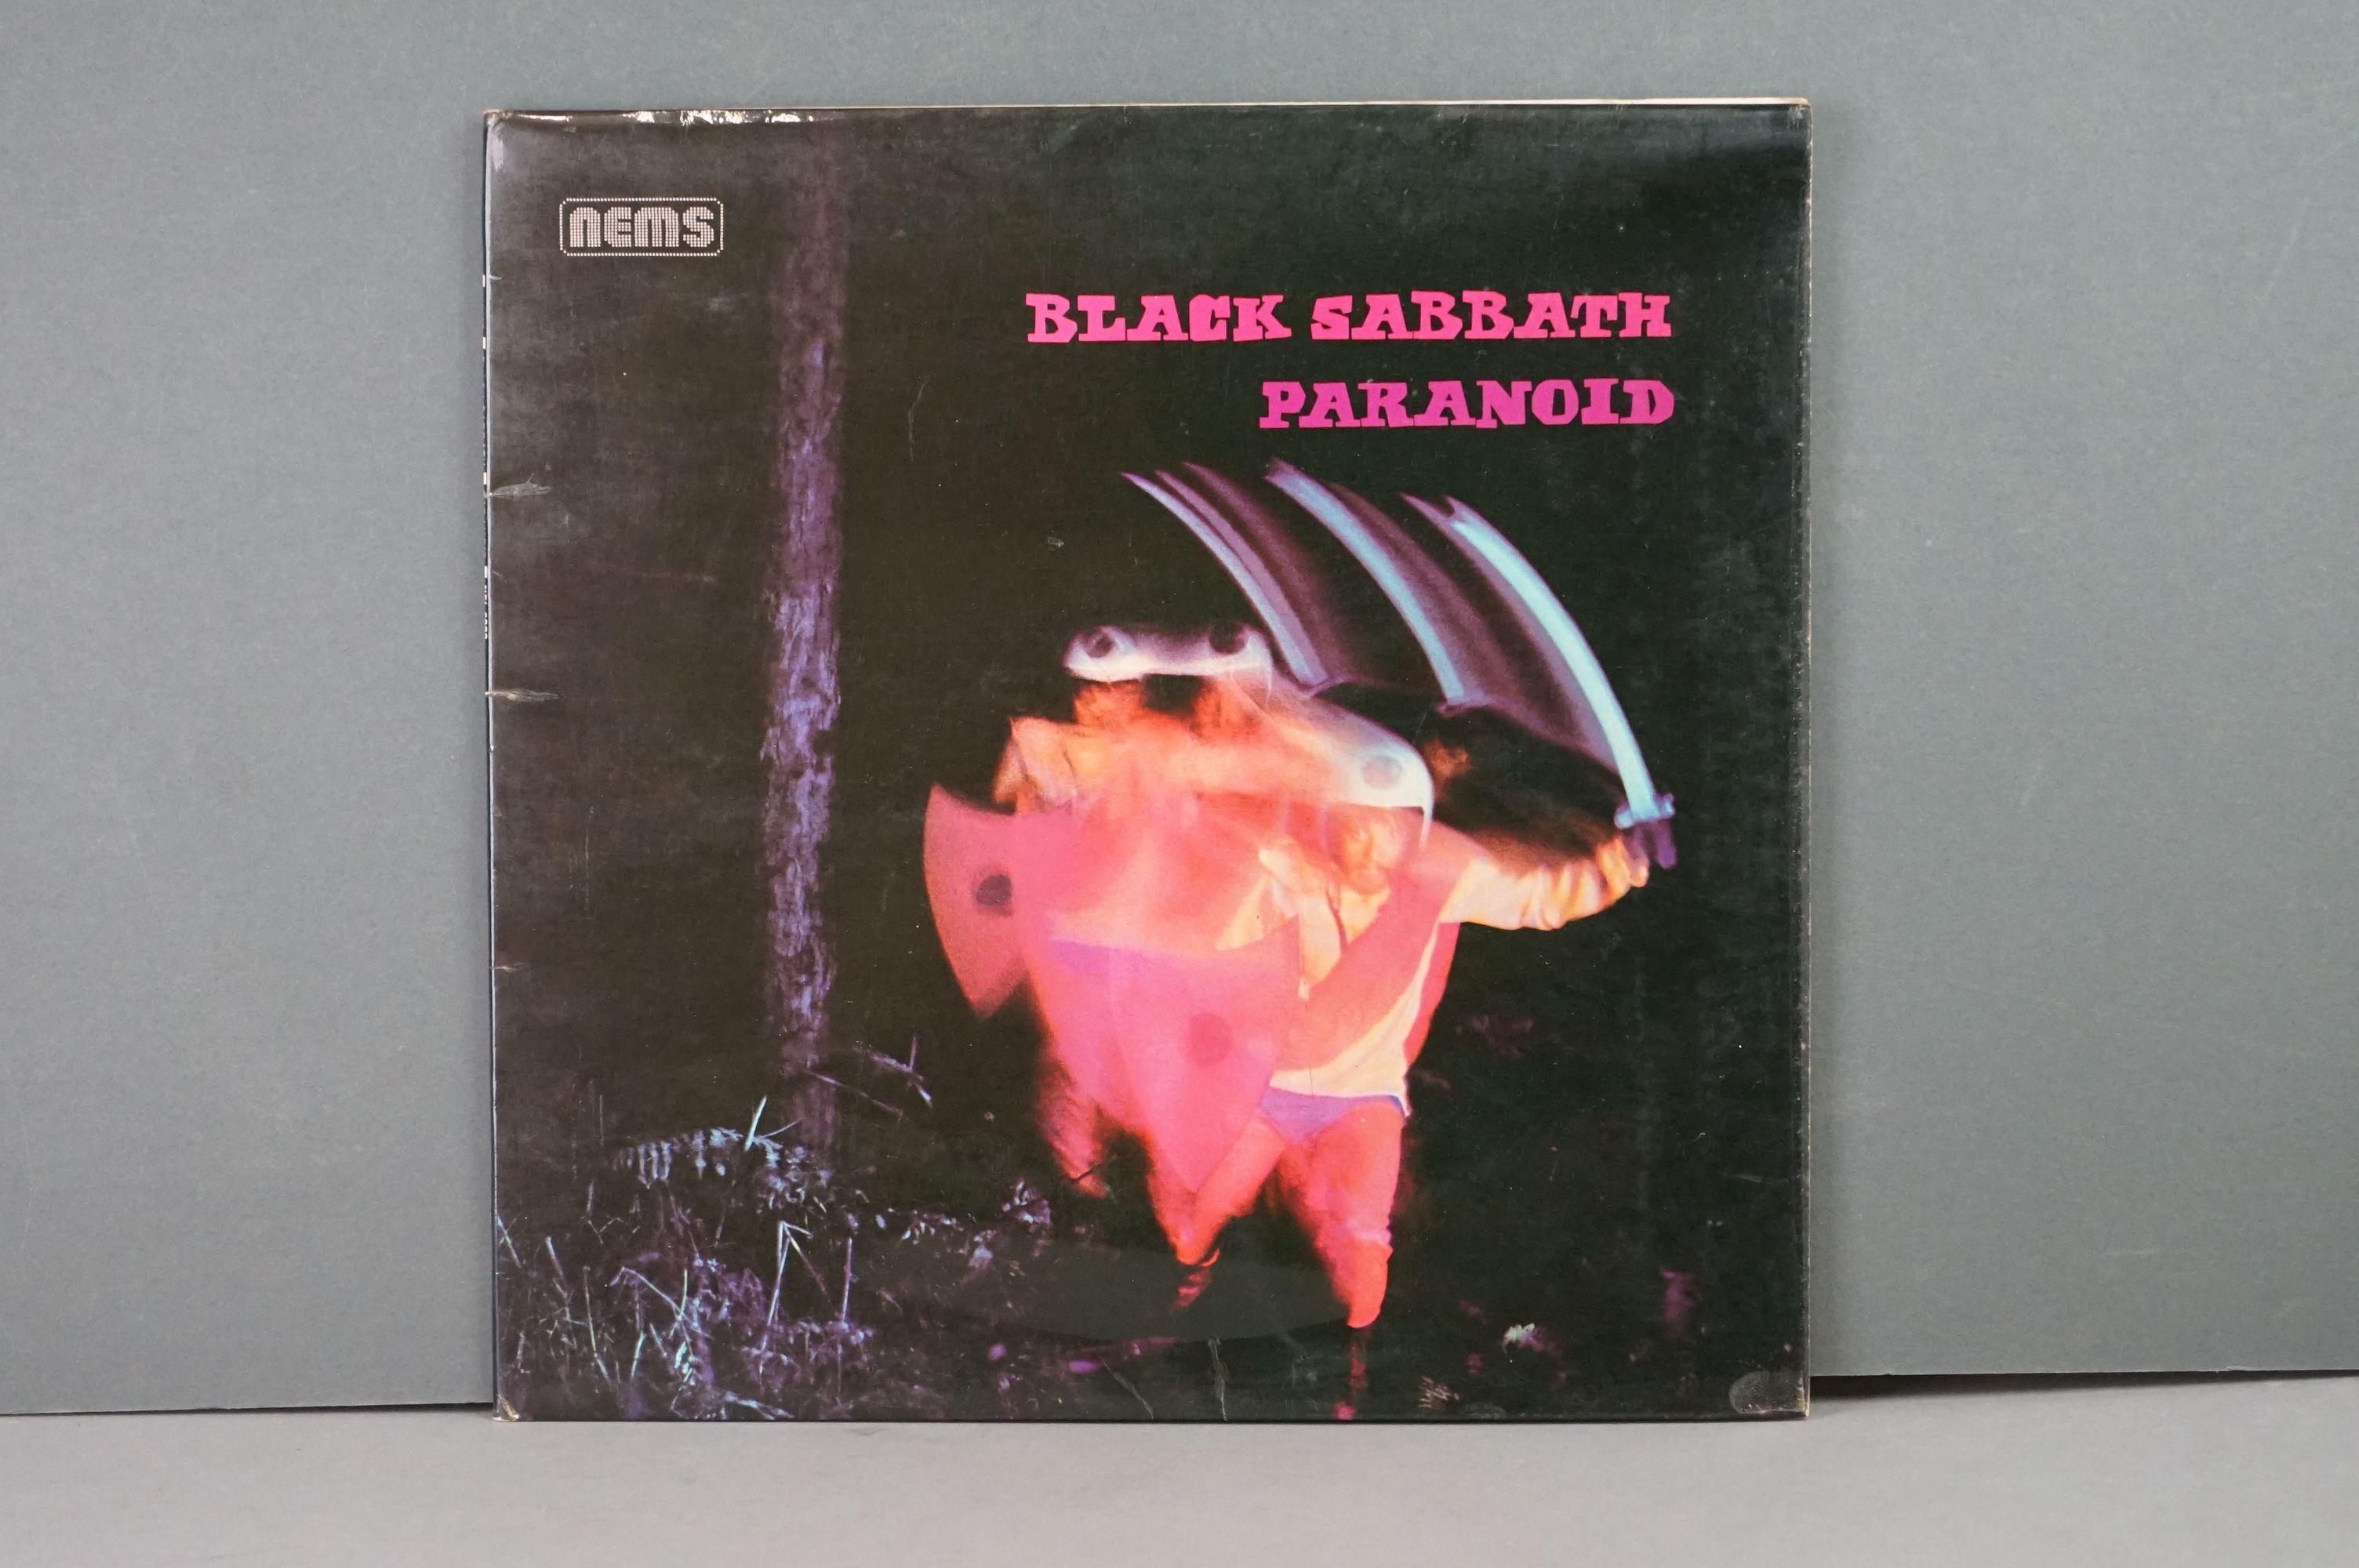 Vinyl - Twelve Black Sabbath vinyl LP's to include Technical Ecstasy (Vertigo Records PRICE 40), - Image 17 of 17